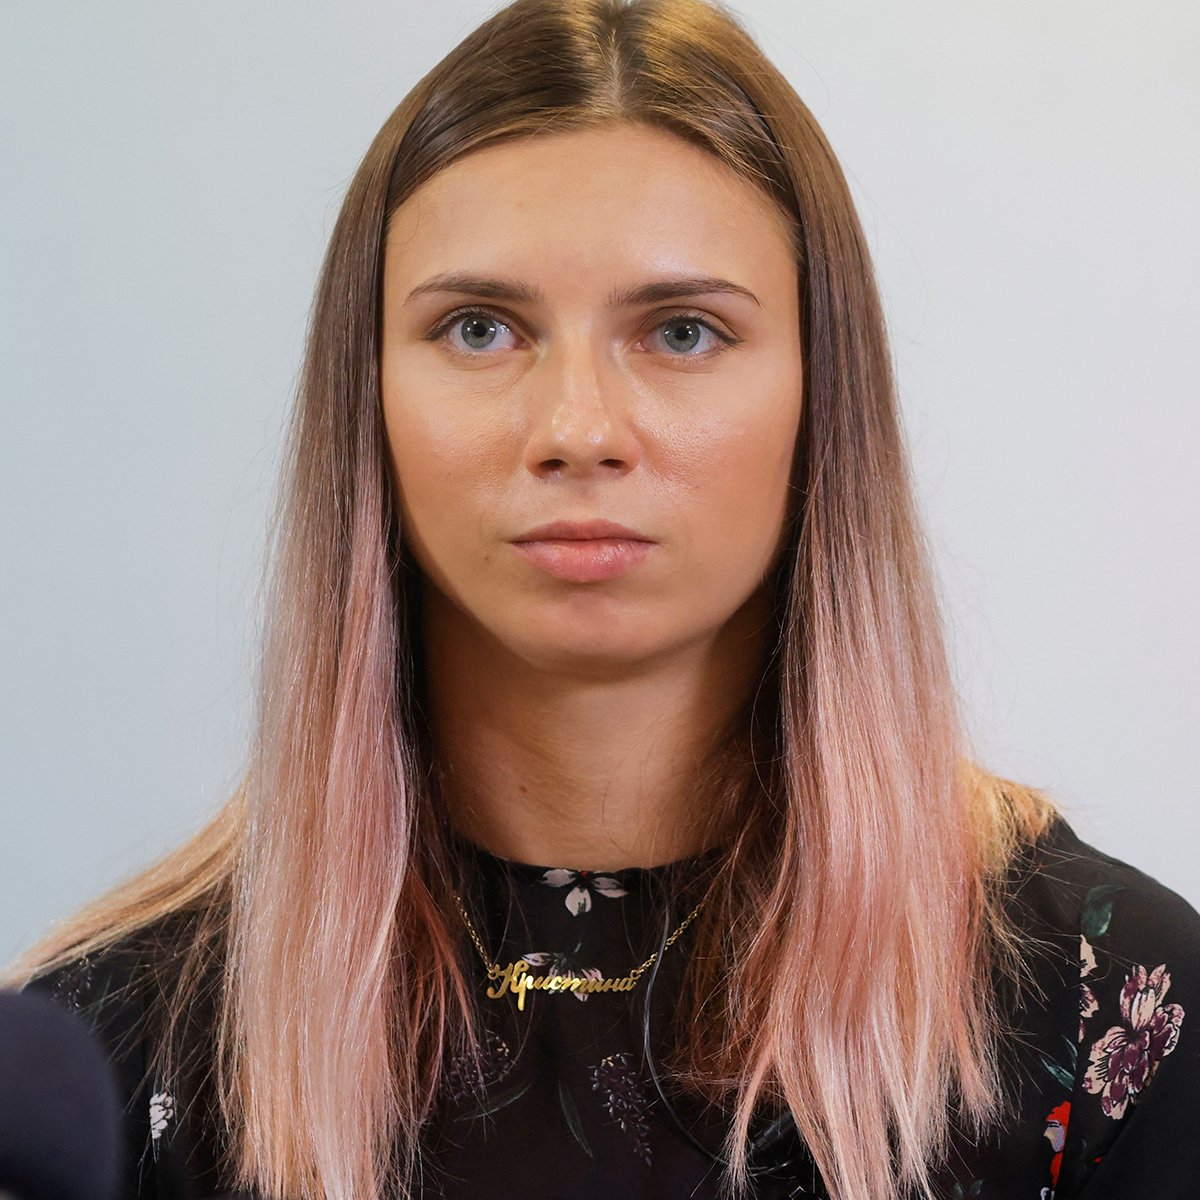 Why Belarusian Olympian Krystsina Tsimanouskaya Is Auctioning Medal After Seeking Asylum